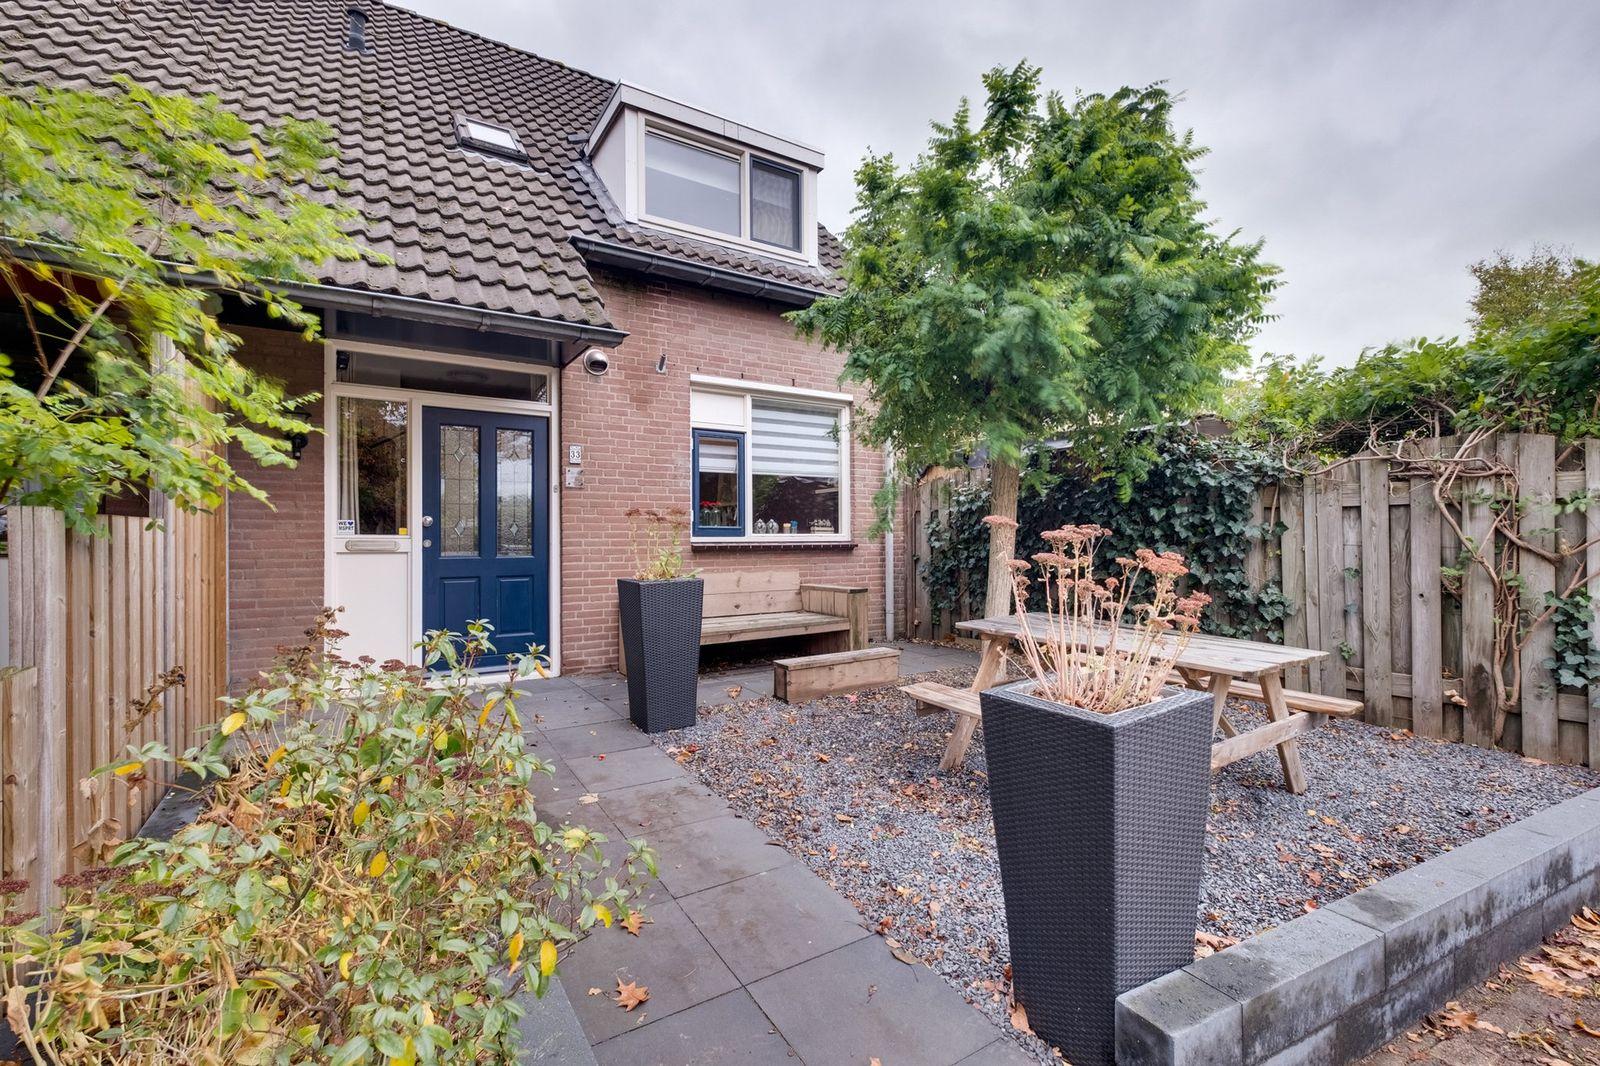 Gooiland 33, 's-hertogenbosch